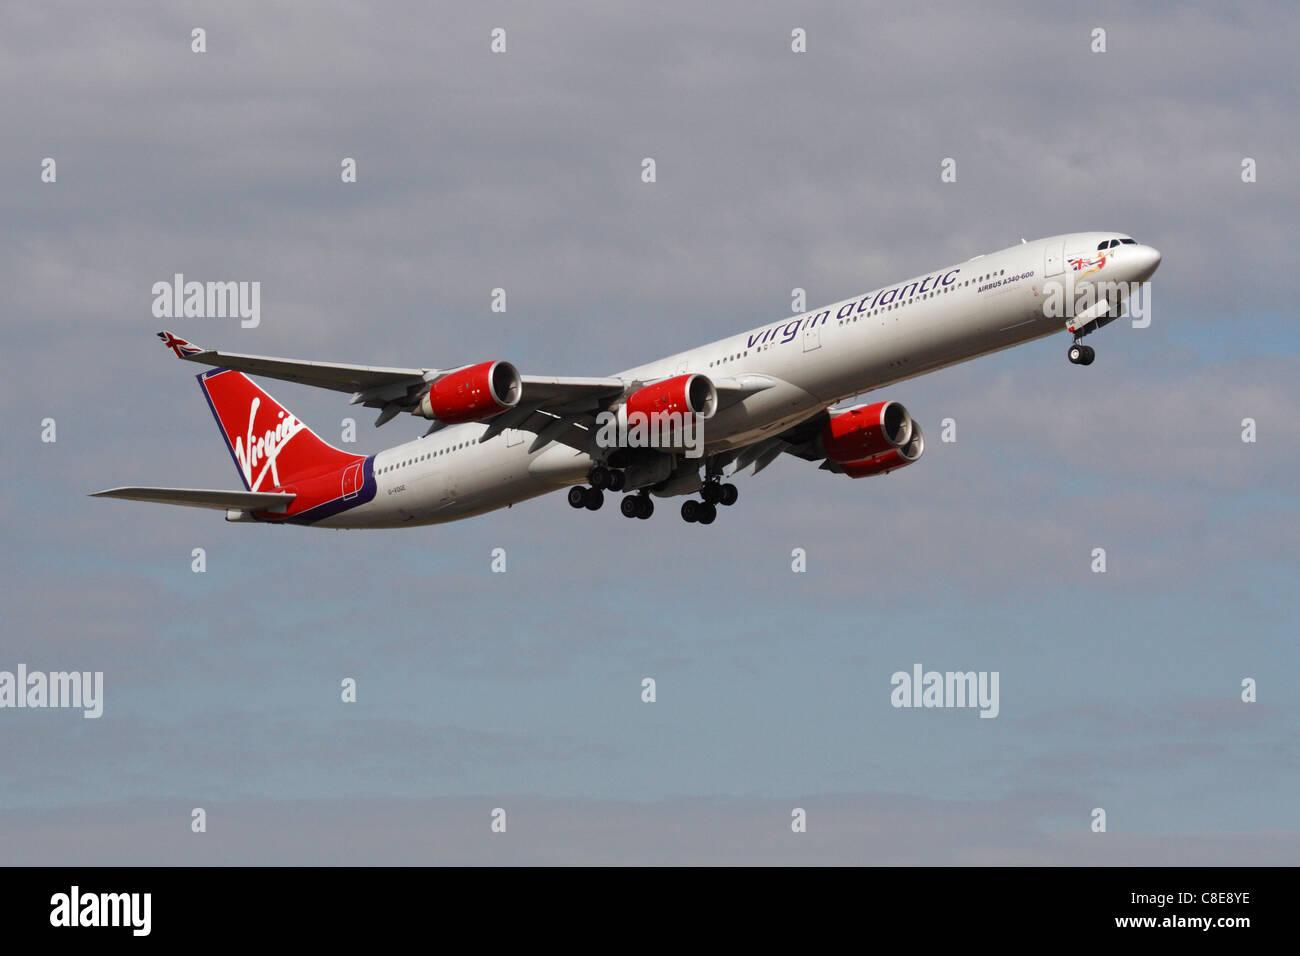 Long haul air travel. Virgin Atlantic Airways Airbus A340-600 airliner departing from London Heathrow - Stock Image